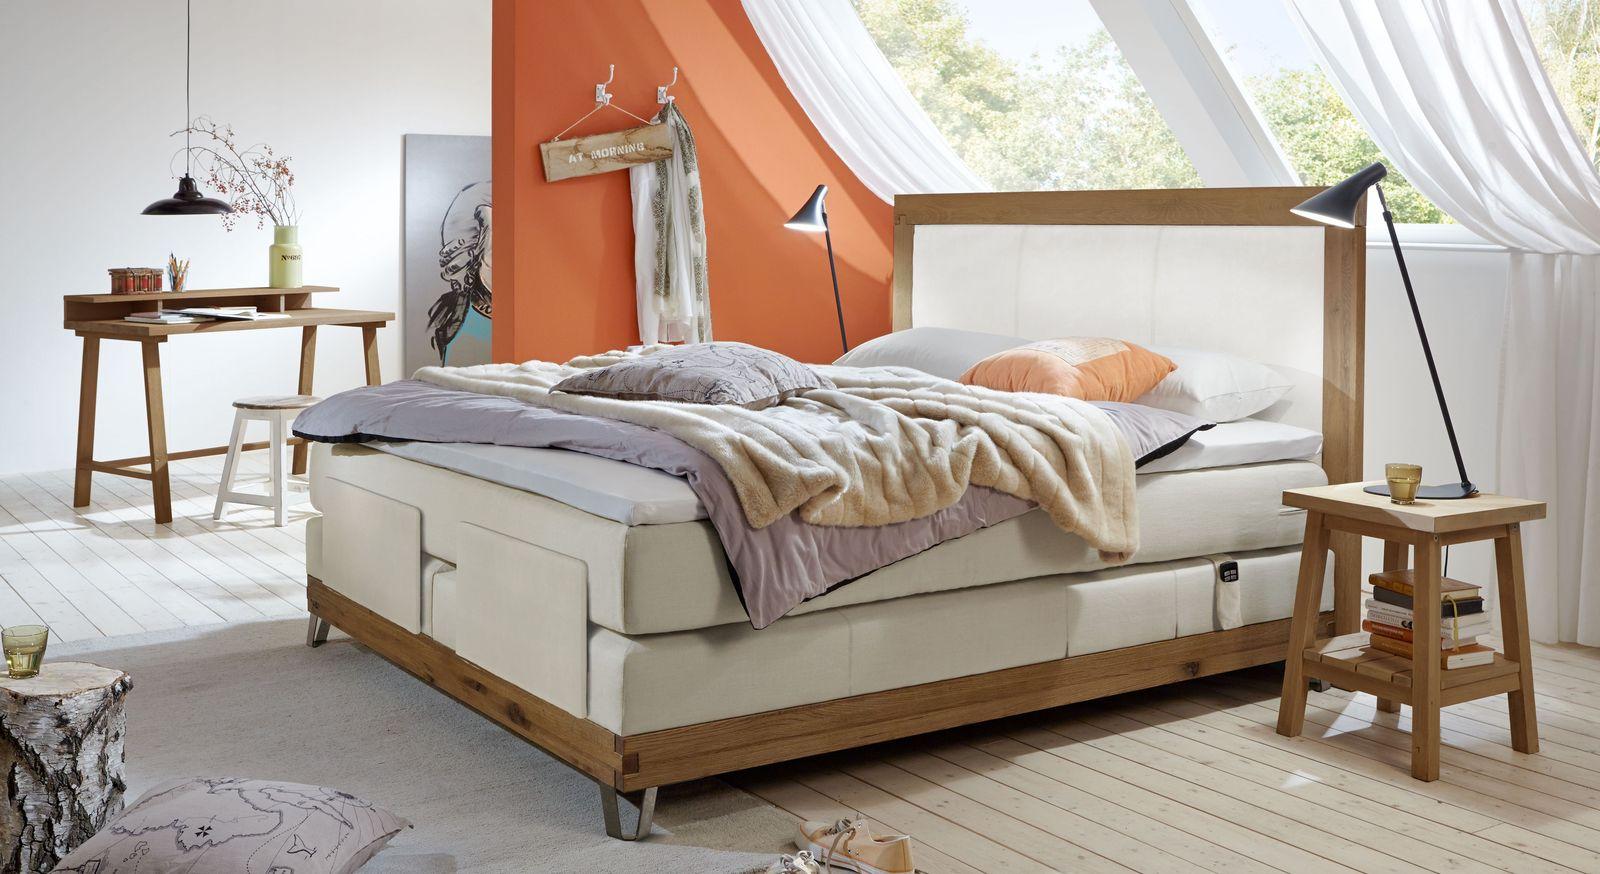 Boxspringbett Arezzino Elektro mit passenden Schlafzimmer-Möbeln